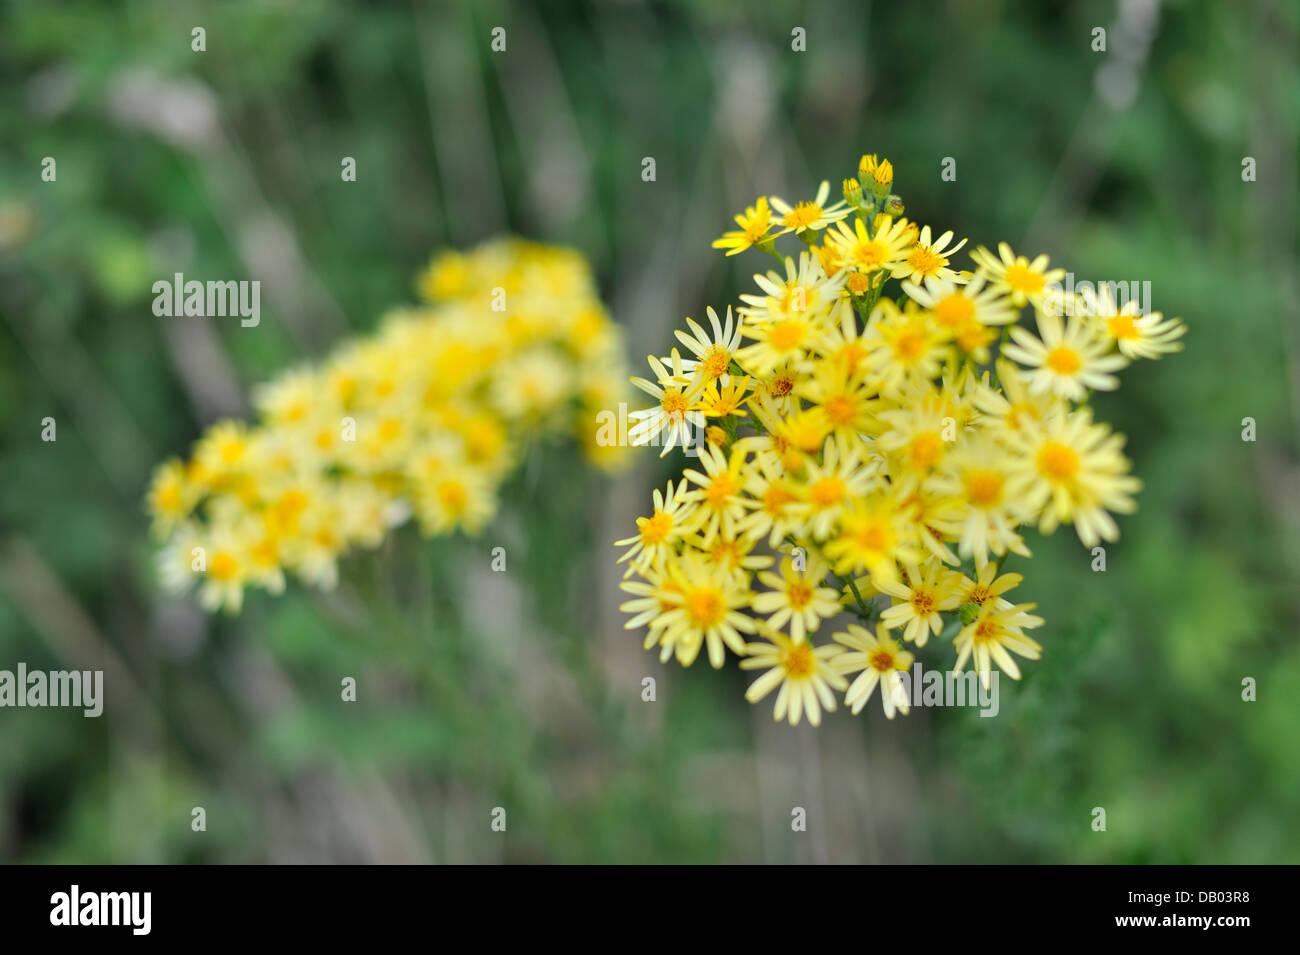 Flowering Common Ragwort (Senecio jacobaea), The Downs, Bristol, UK Stock Photo